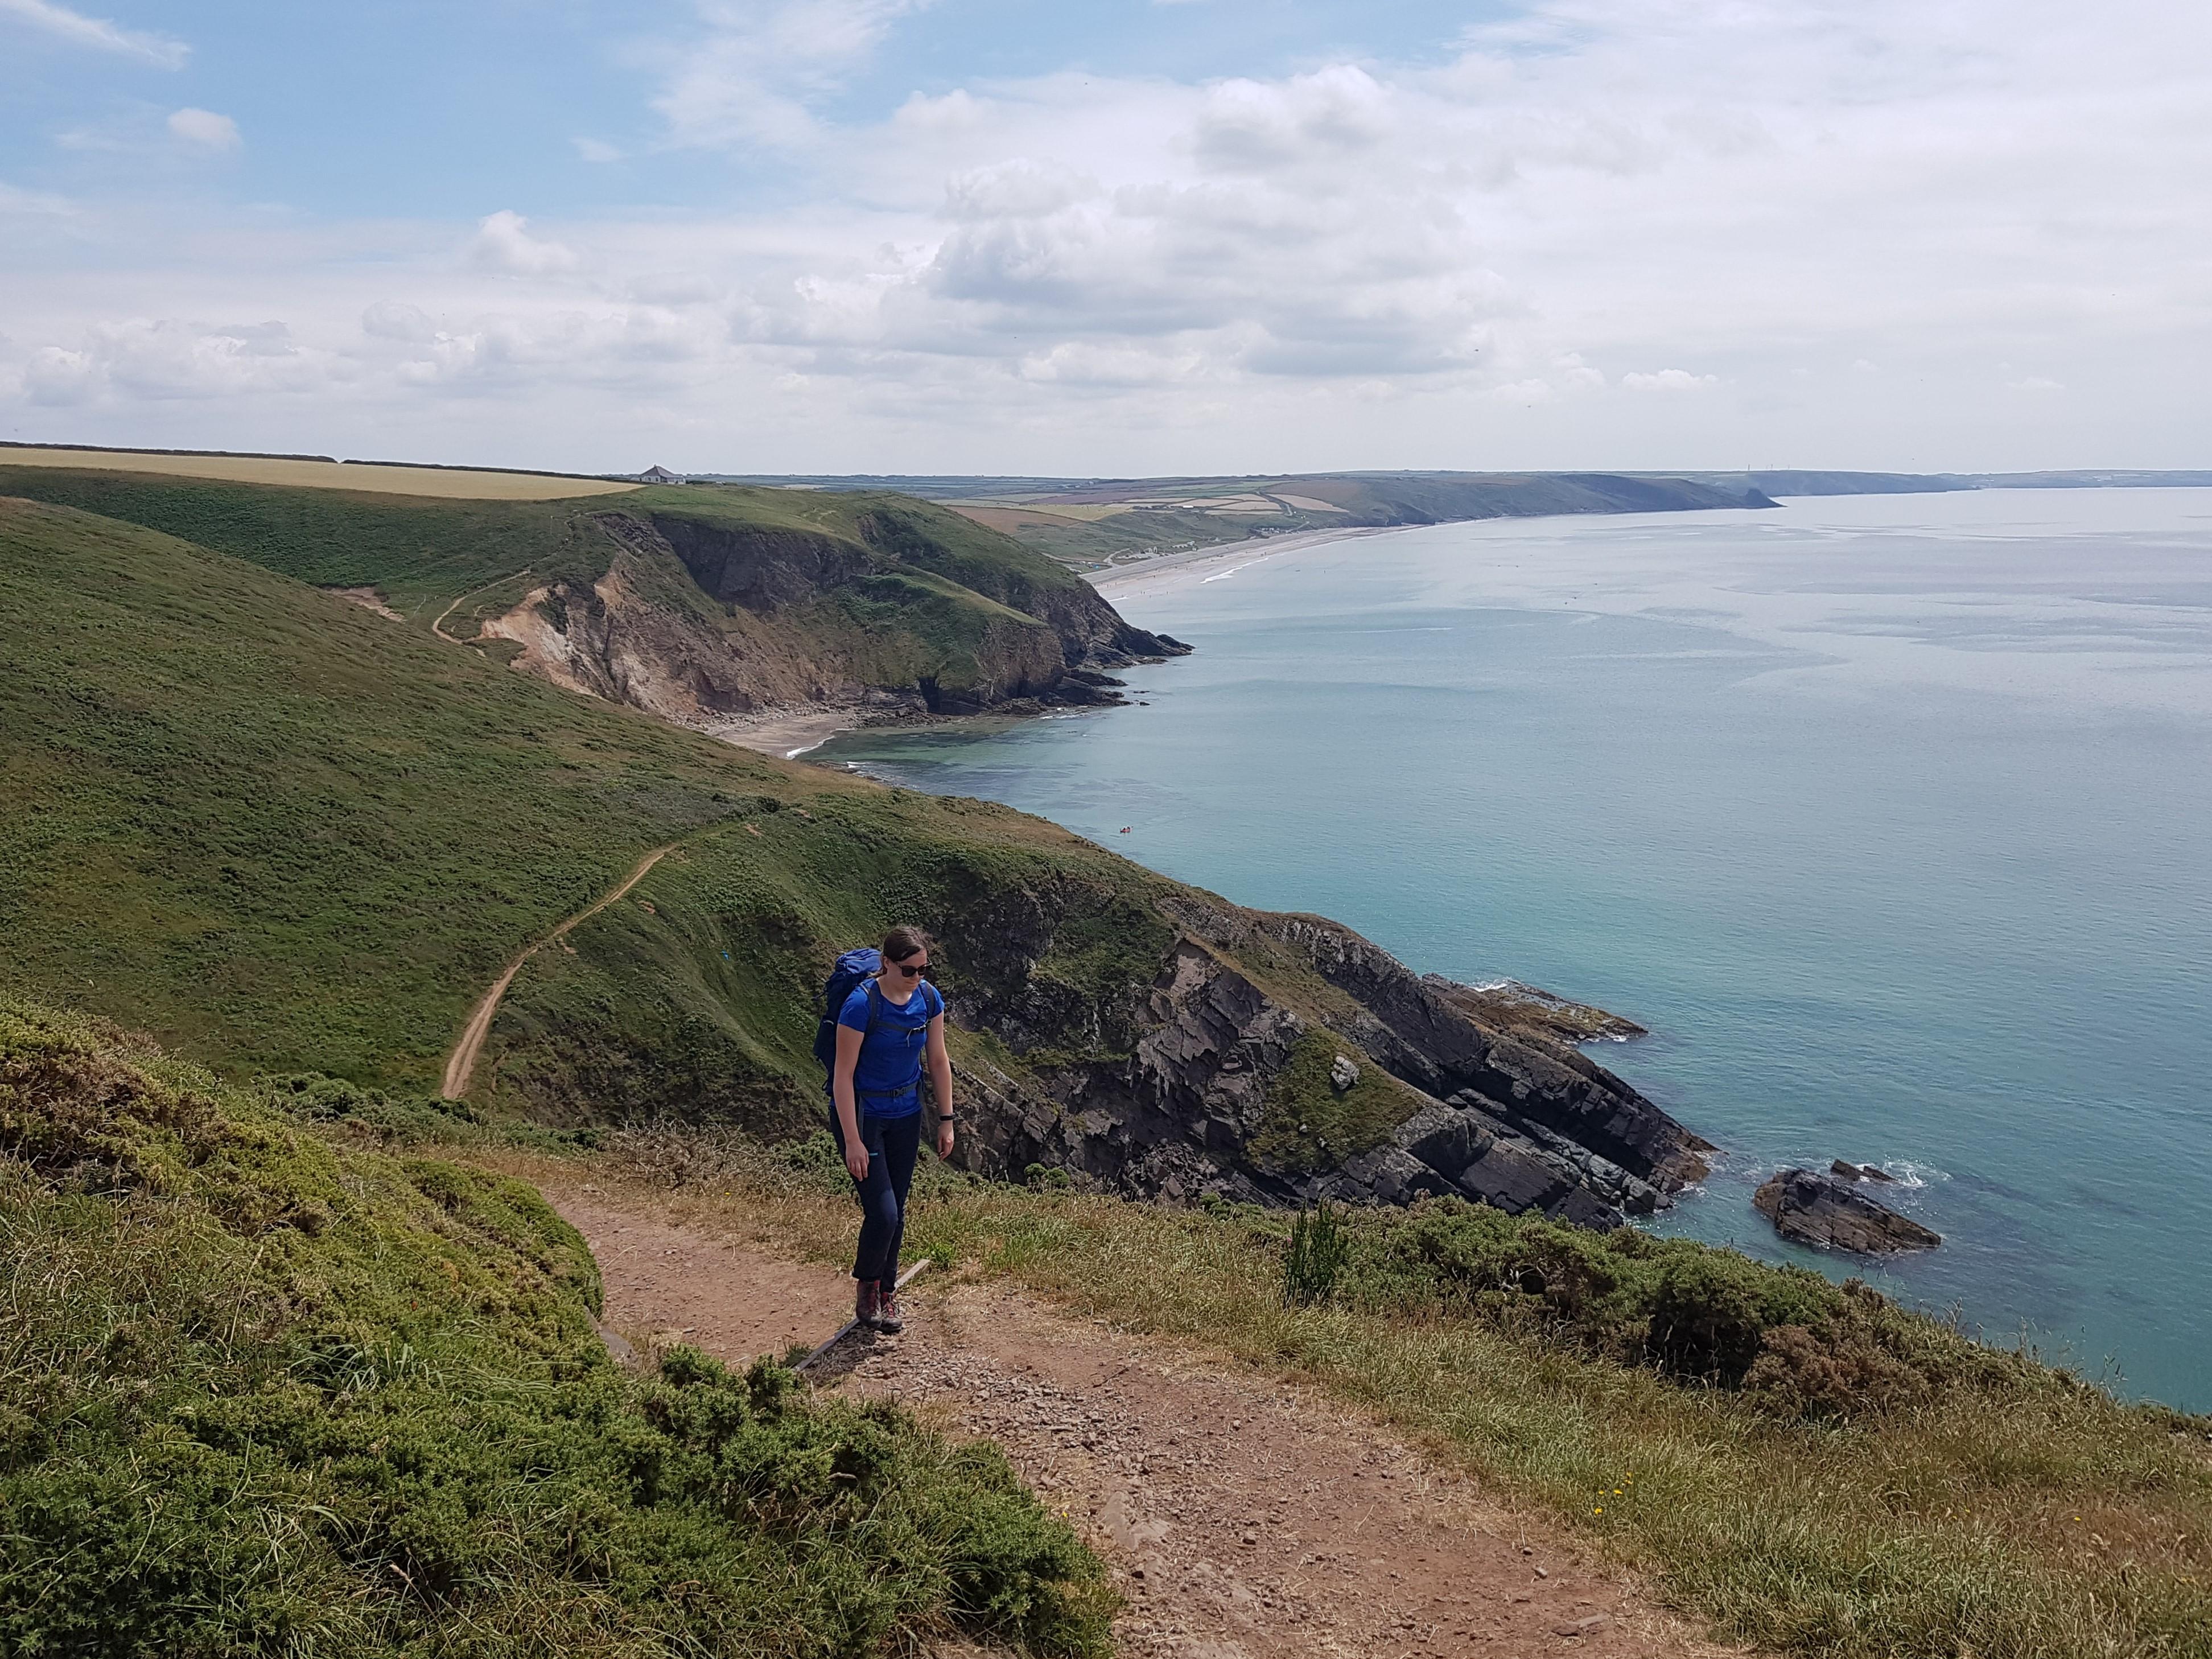 Monika on the Pembrokeshire Coast Path